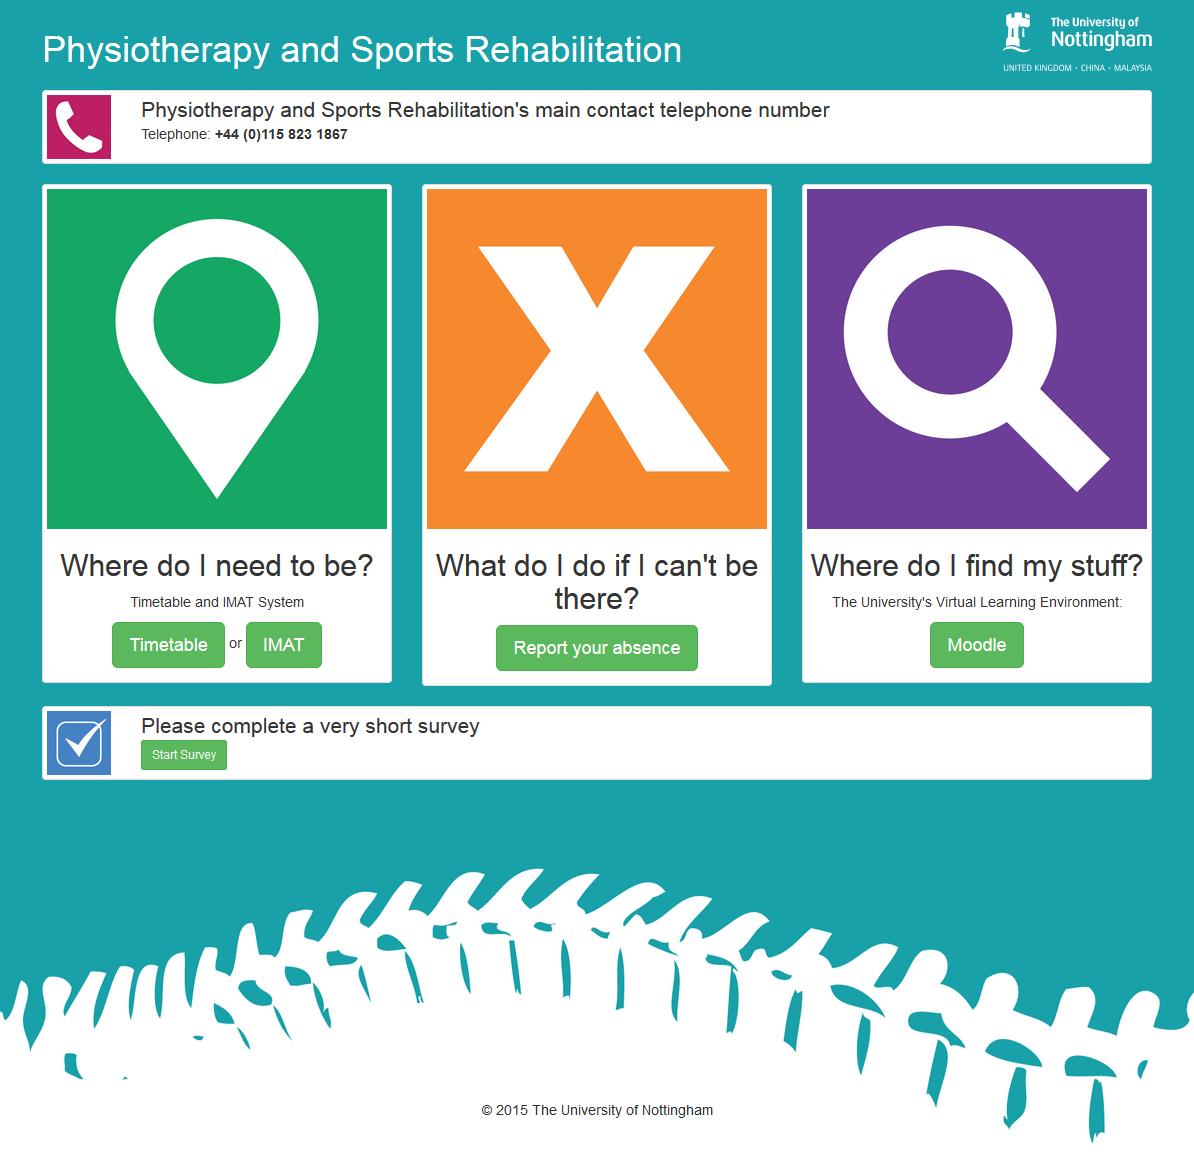 Associated online information resource